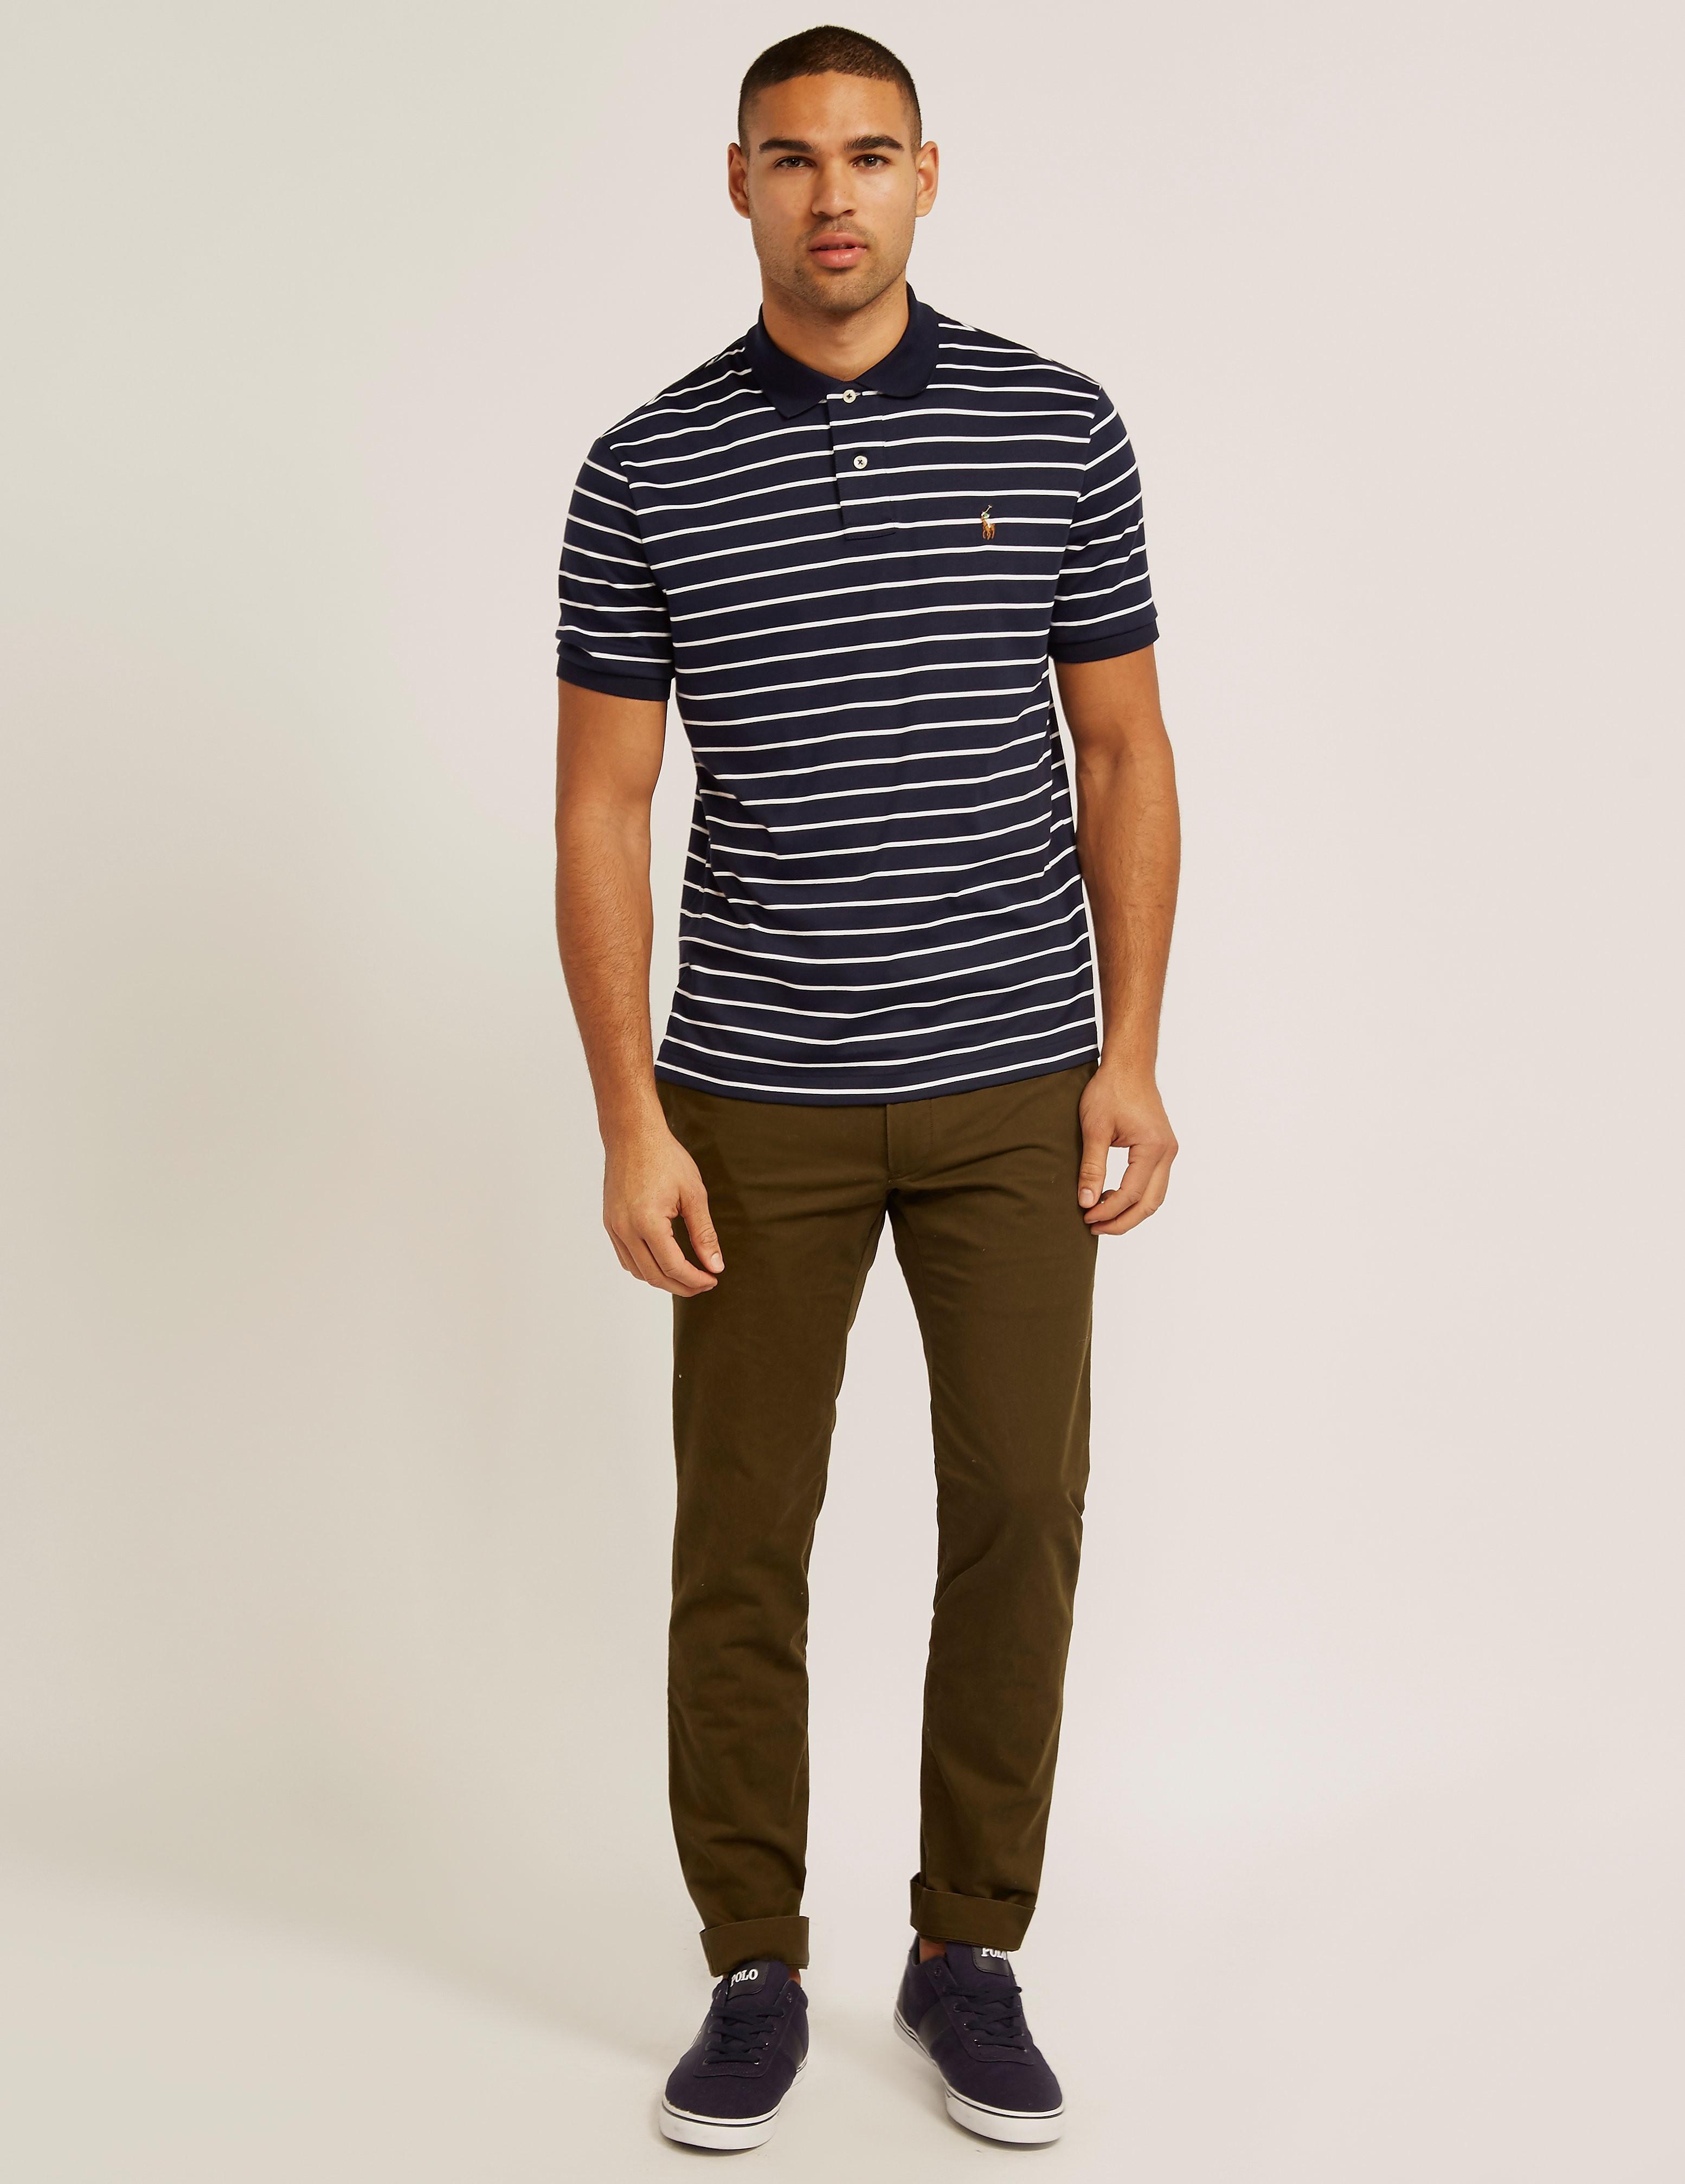 Polo Ralph Lauren Stripe Polo Shirt